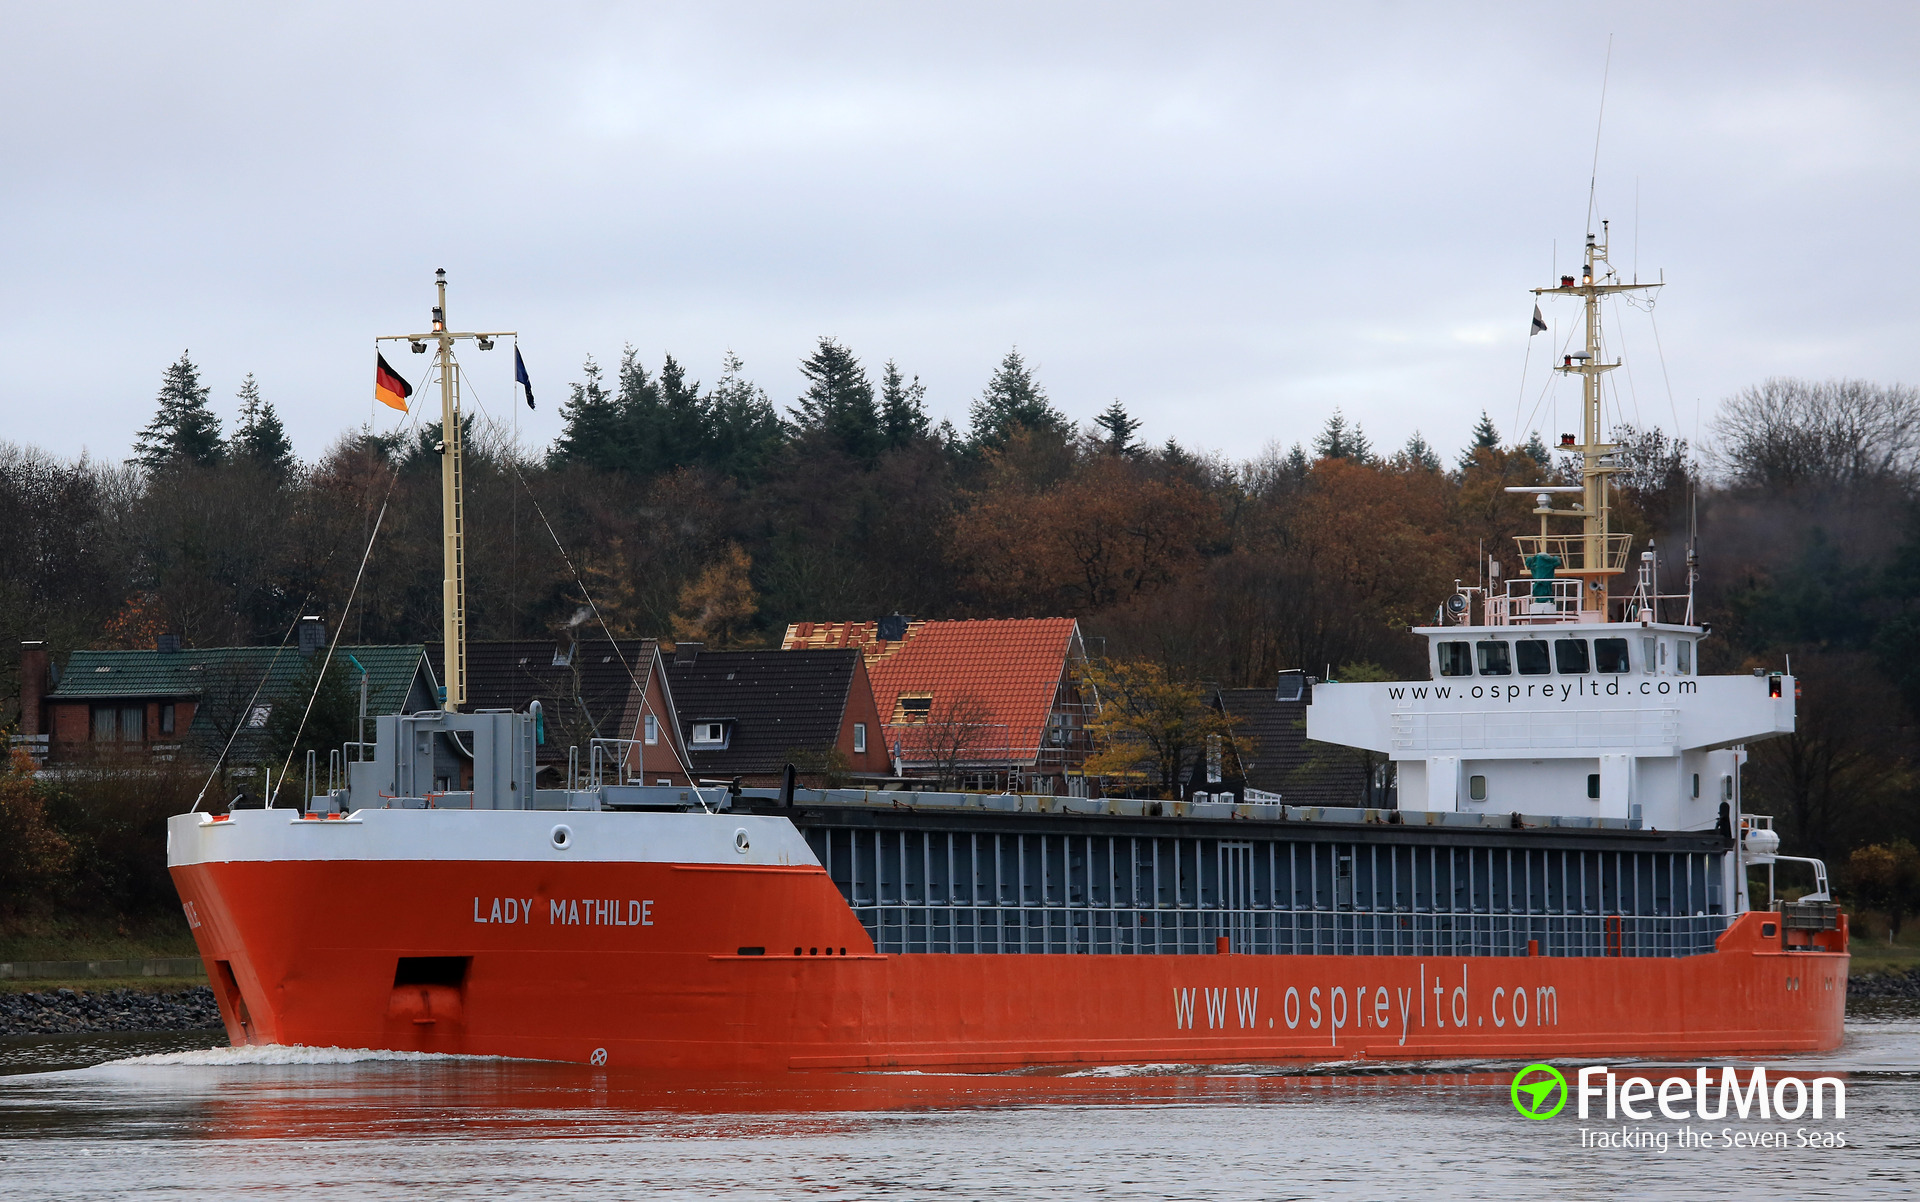 LADY MATHILDE contacted bottom, Kiel Canal